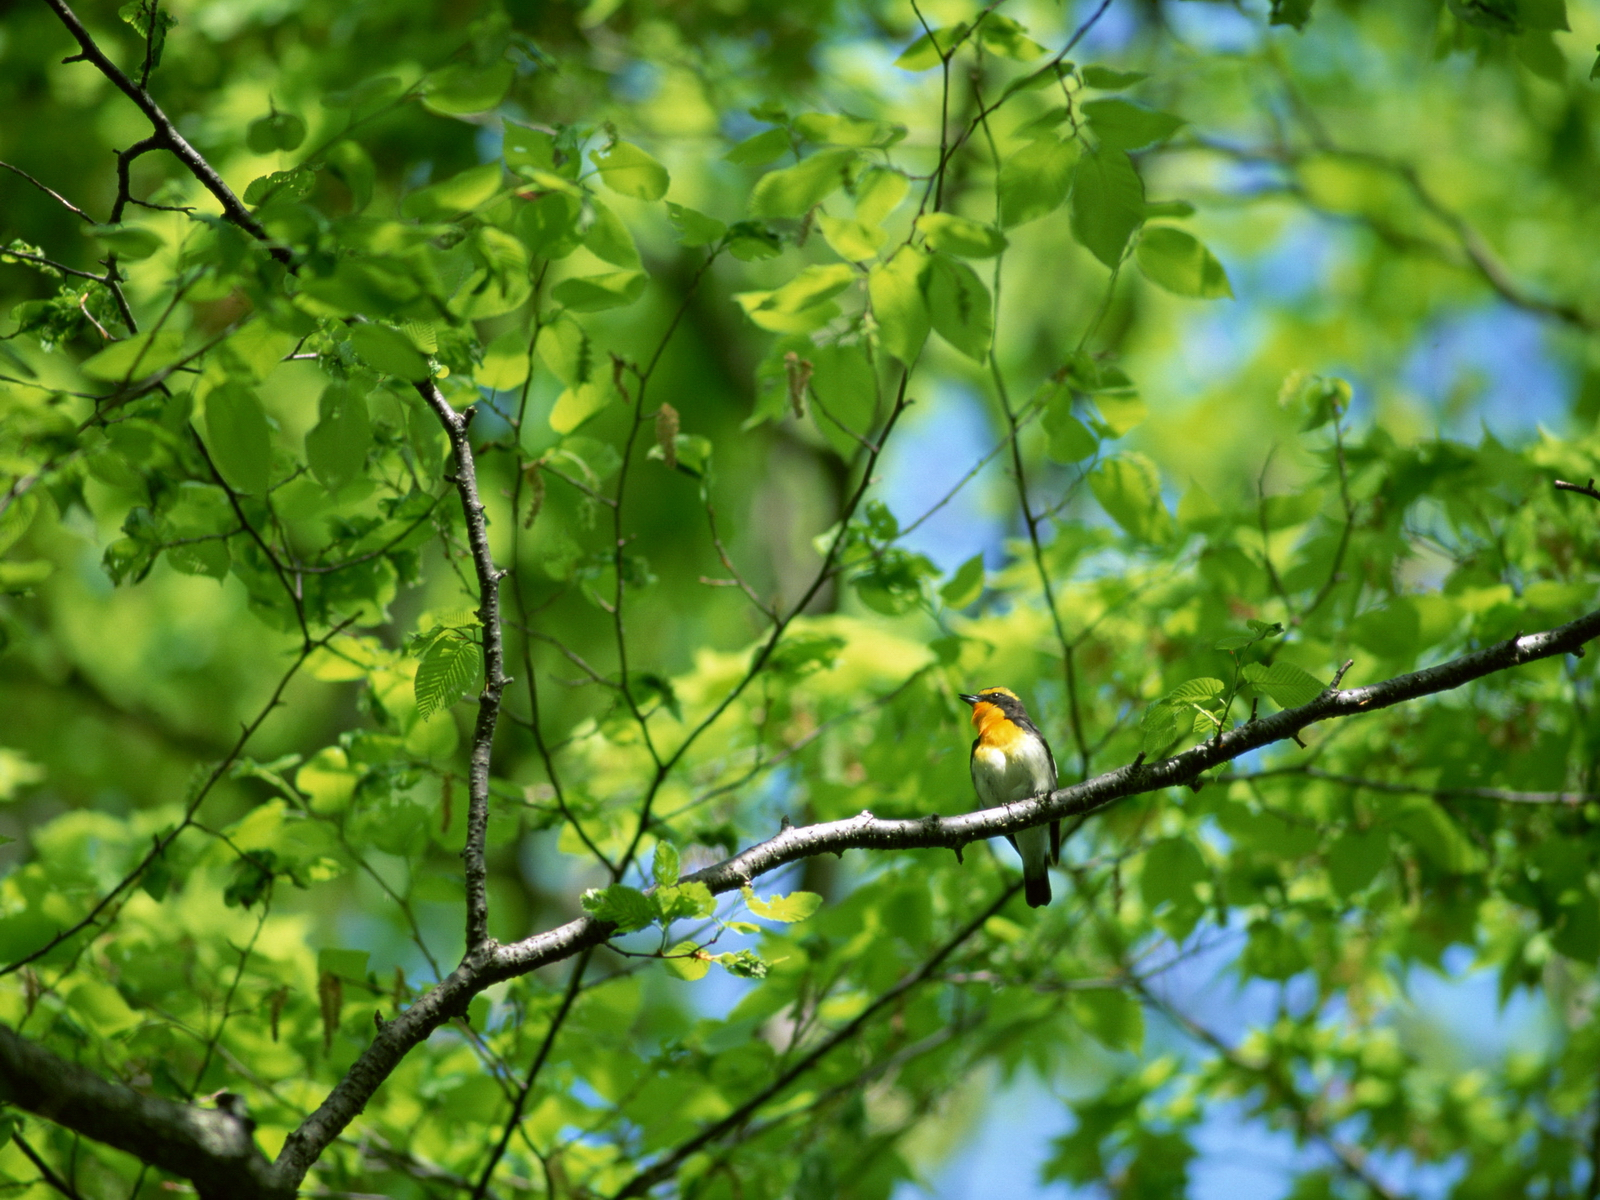 Fullsize Of Bird On A Branch